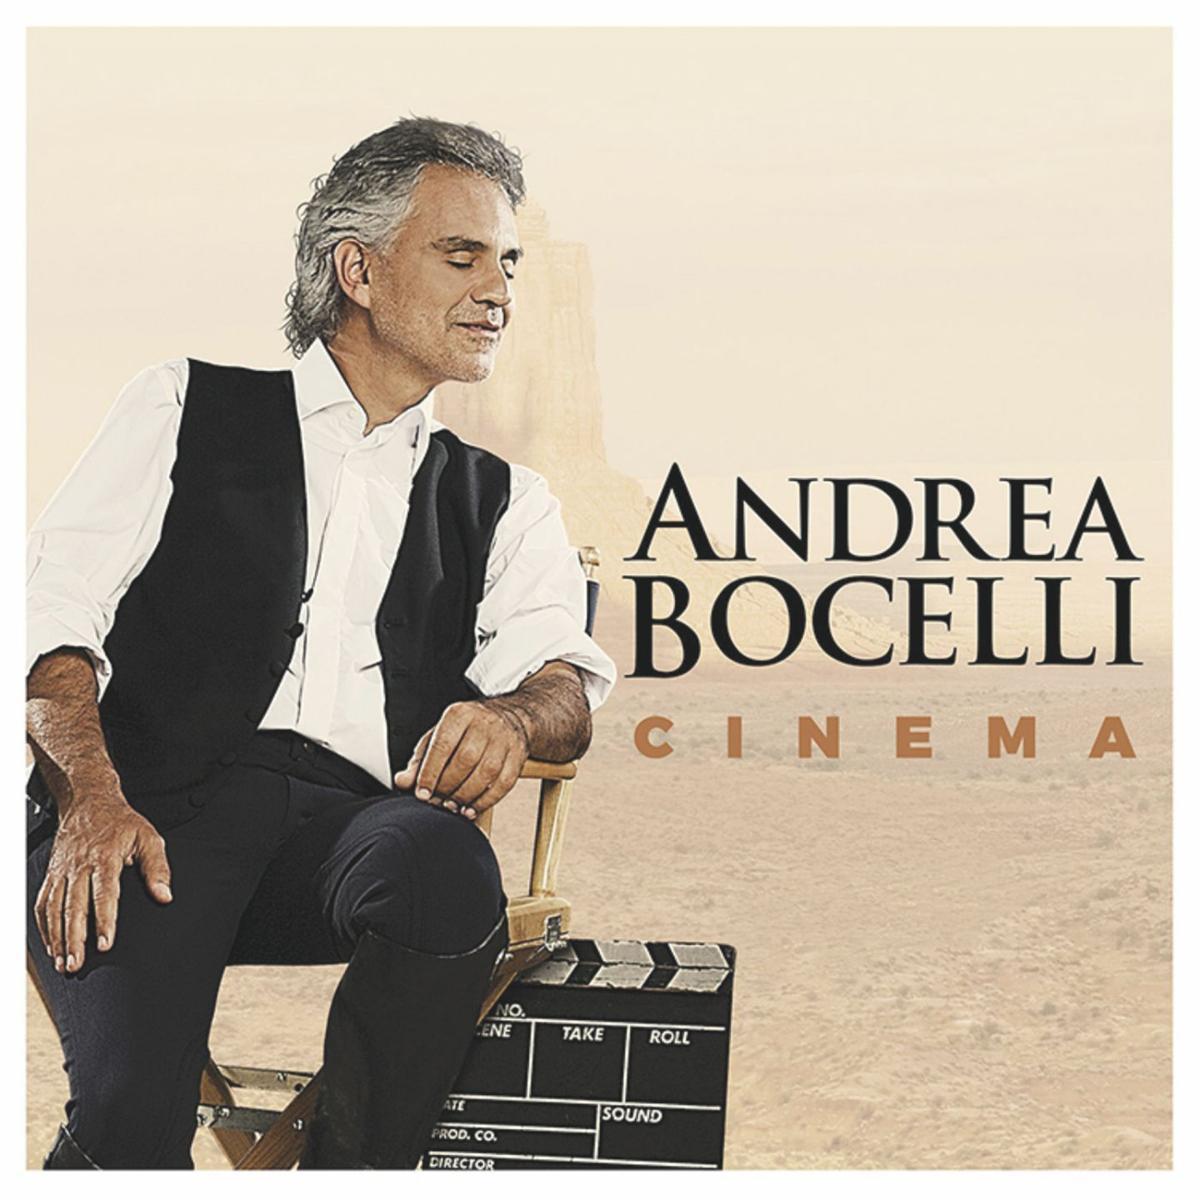 Music review: Andrea Bocelli - 'Cinema' | Clints Music